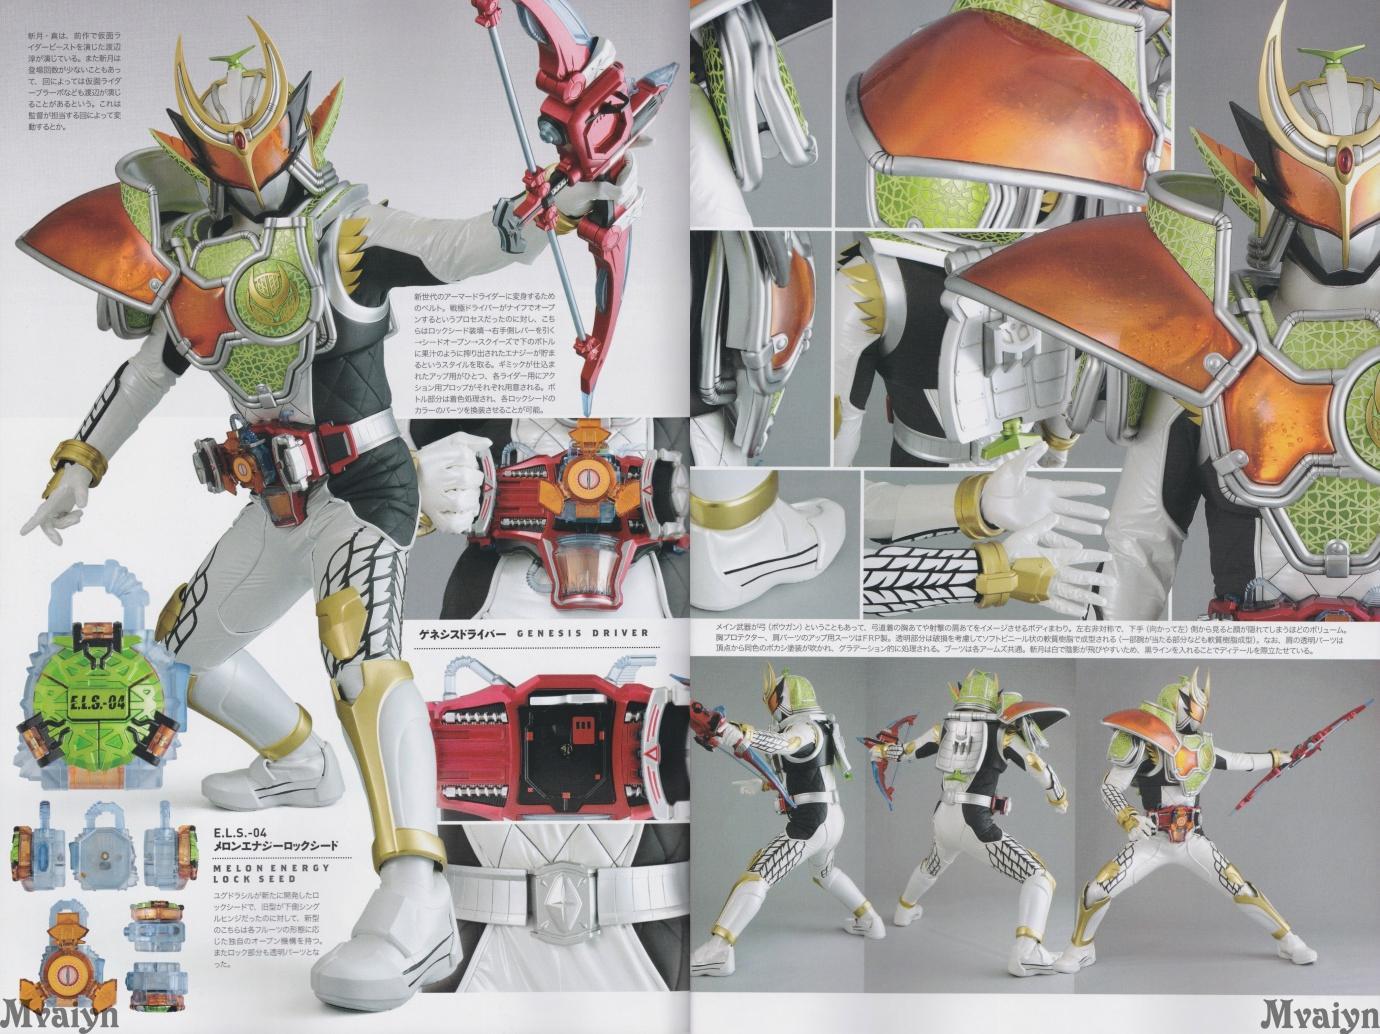 http://news.tokunation.com/wp-content/uploads/sites/5/2014/01/Detail-Of-Hero-Kamen-Rider-Gaim-Energy-Riders-003.jpg